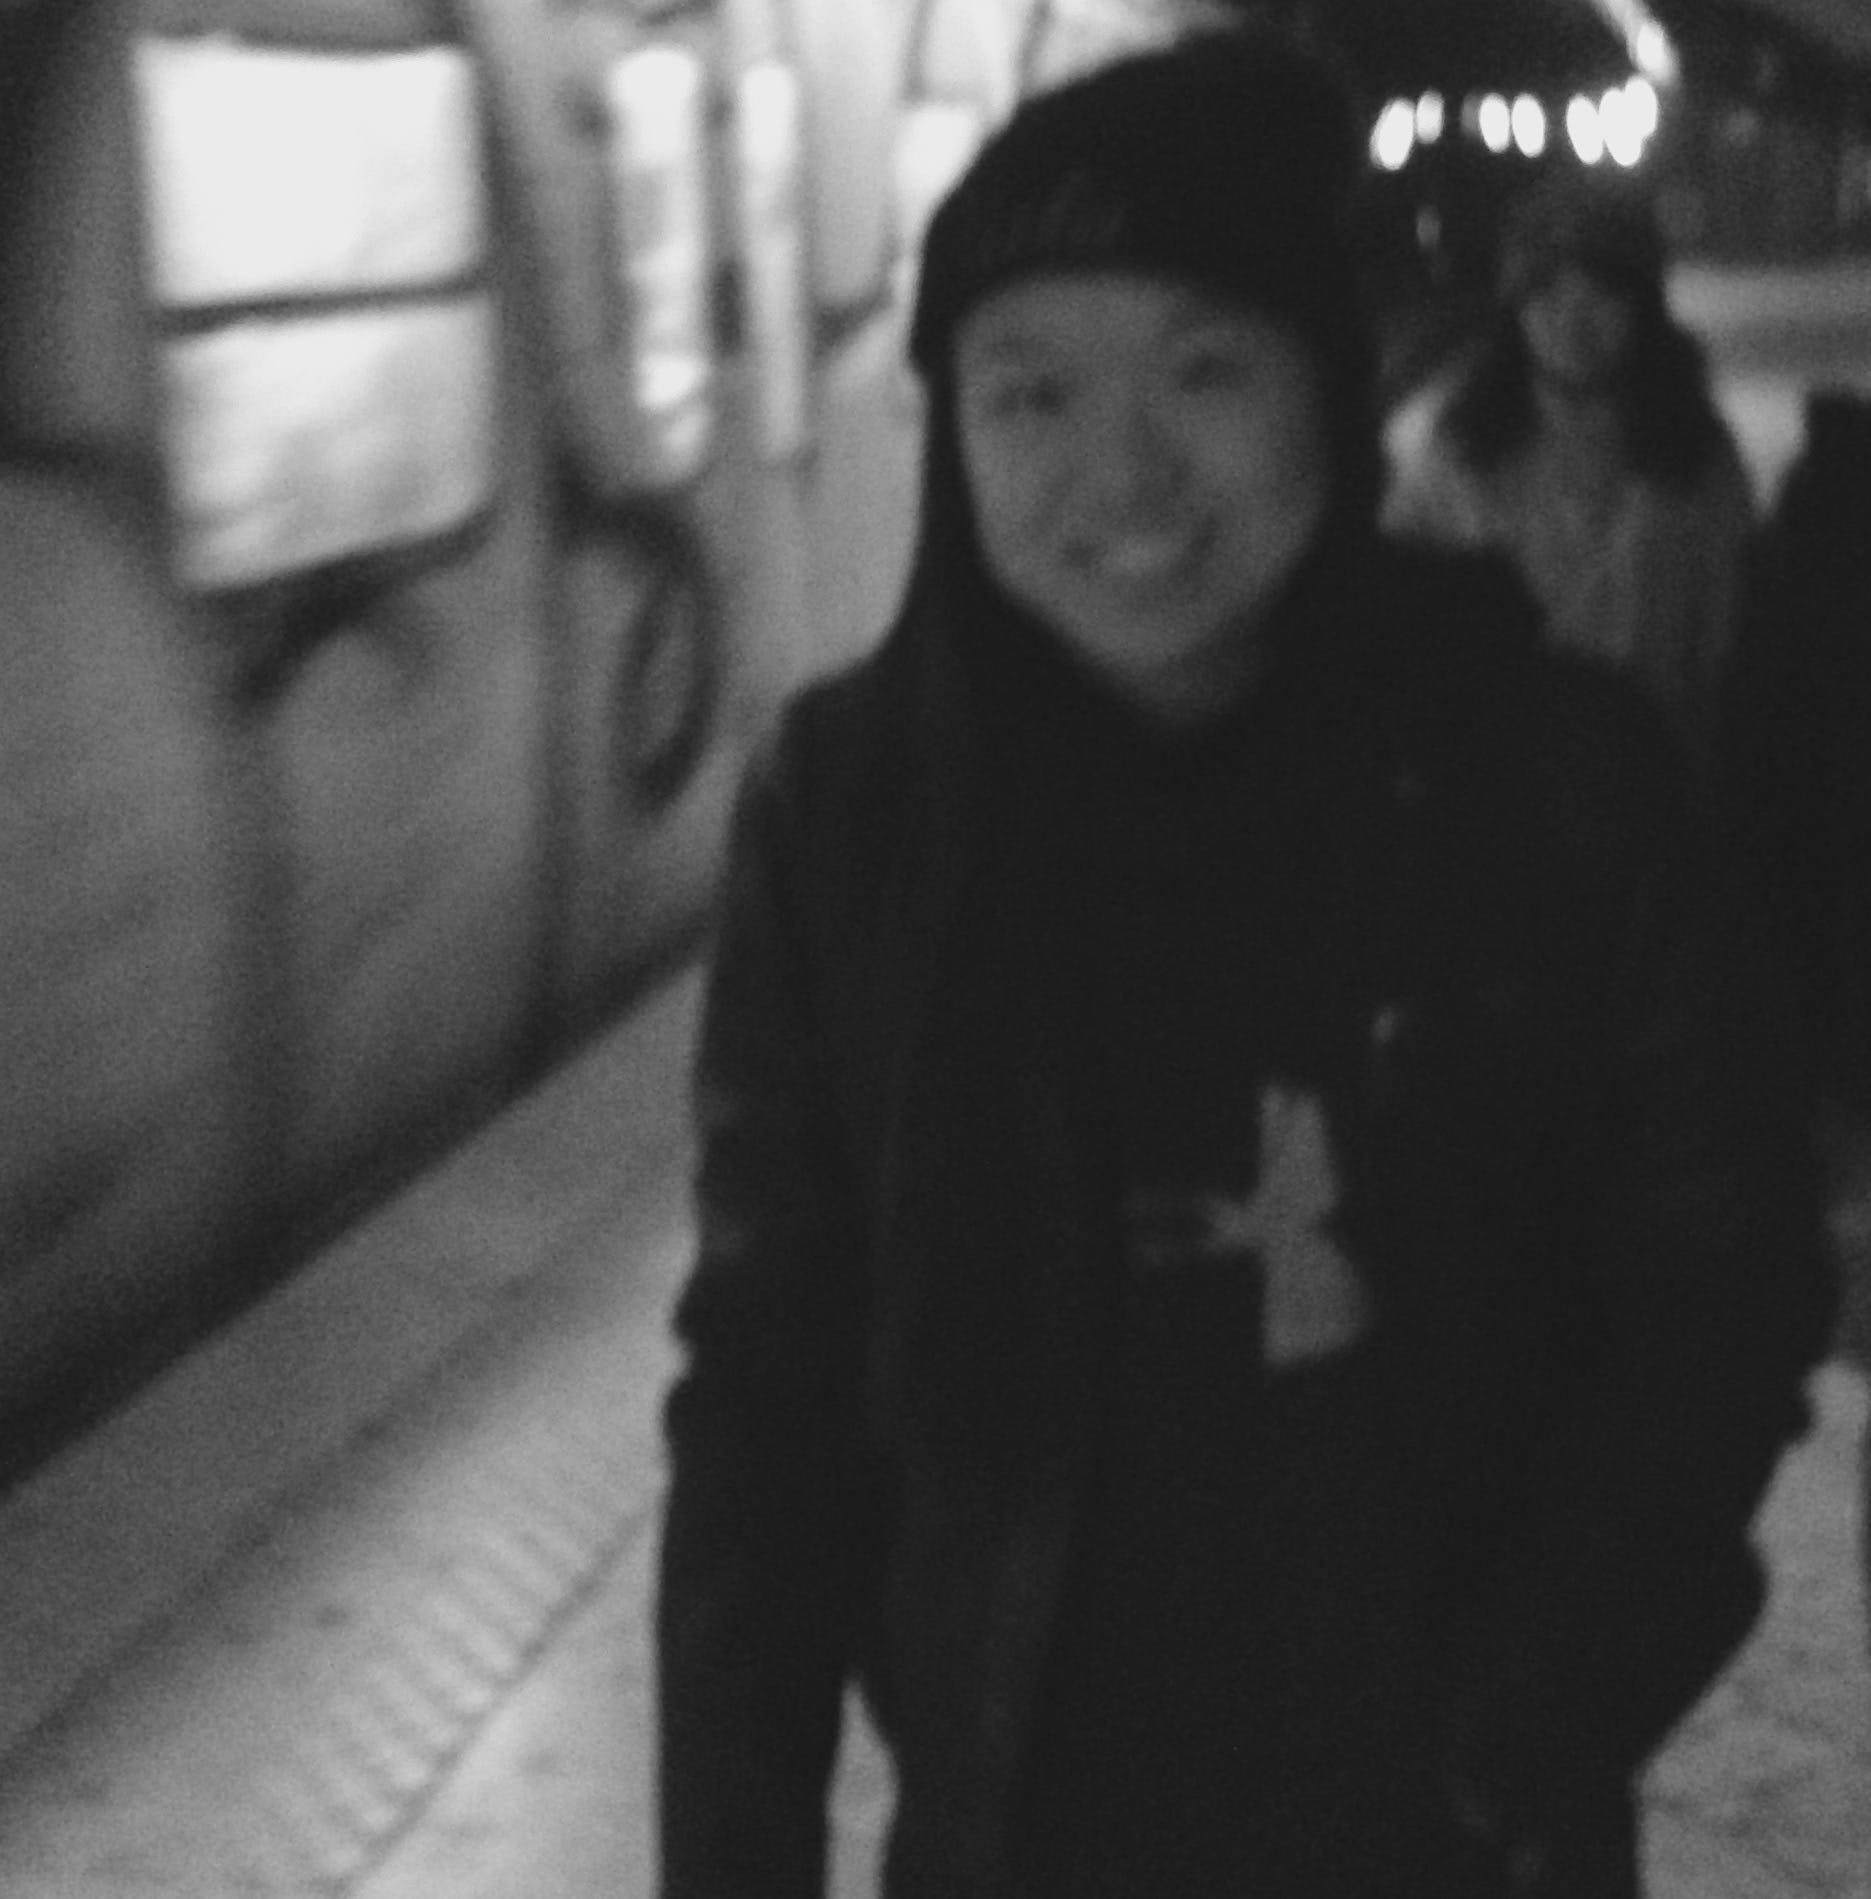 Priscilla Cheng